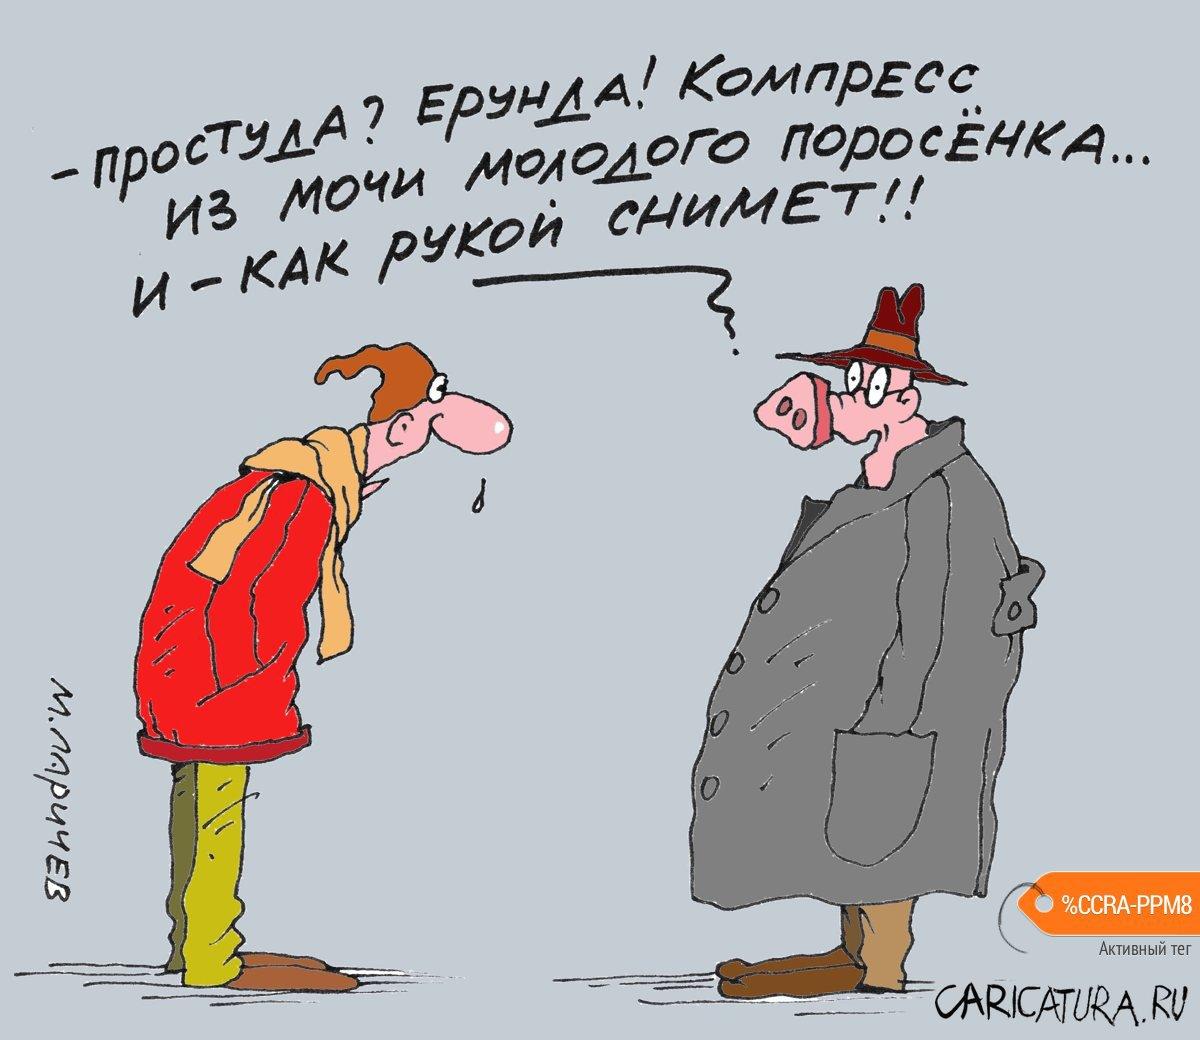 Компресс, Михаил Ларичев